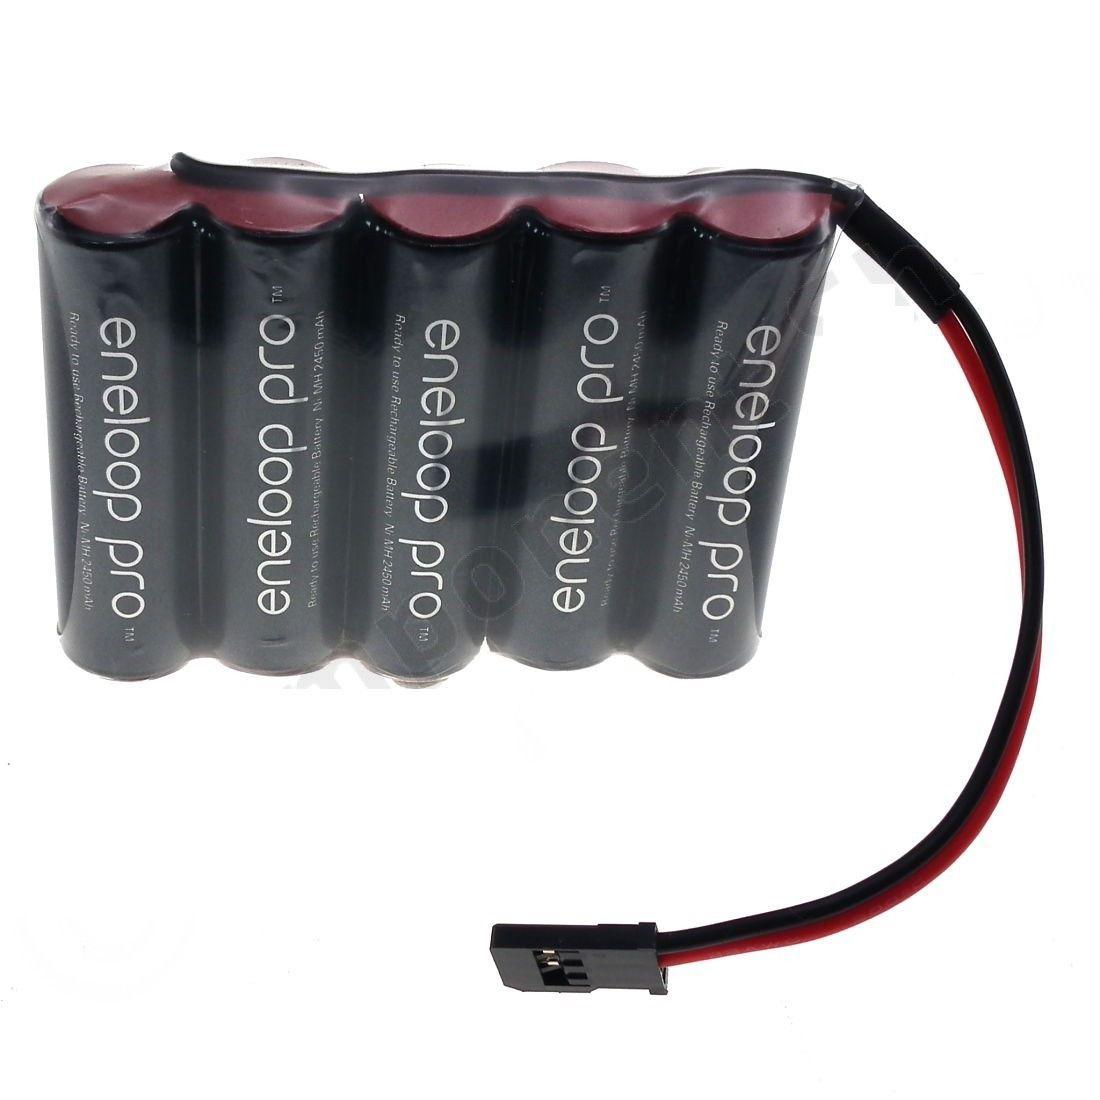 Bateria 6v Aa 2550mah Ni-mh Panasonic Eneloop Pro Futaba Rc